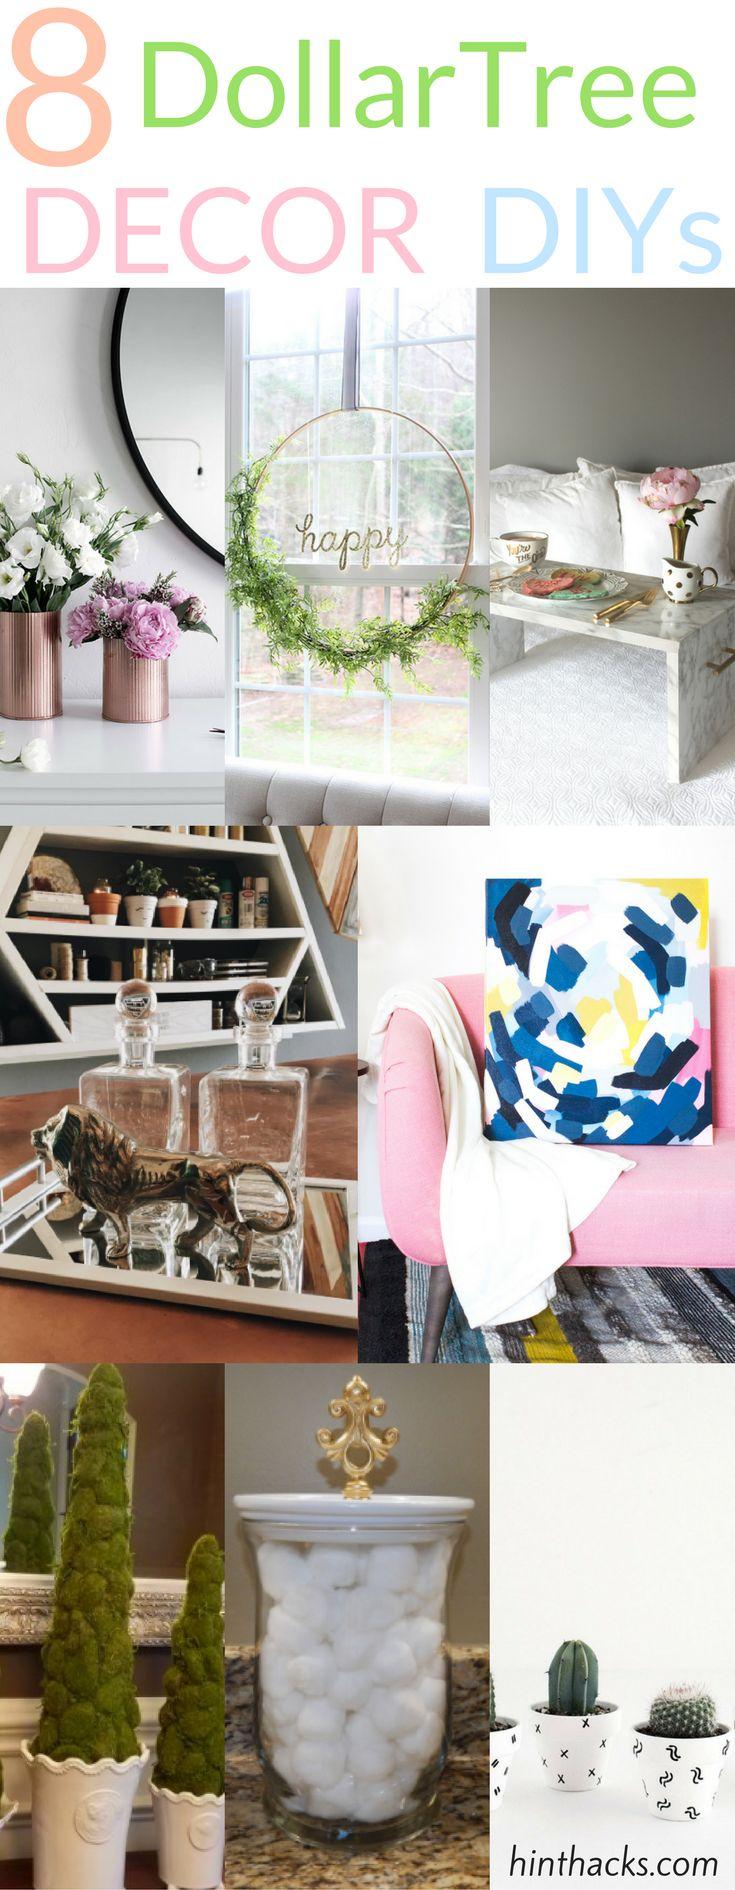 3 Easy Diy Storage Ideas For Small Kitchen: Best 25+ Dollar Tree Vases Ideas On Pinterest